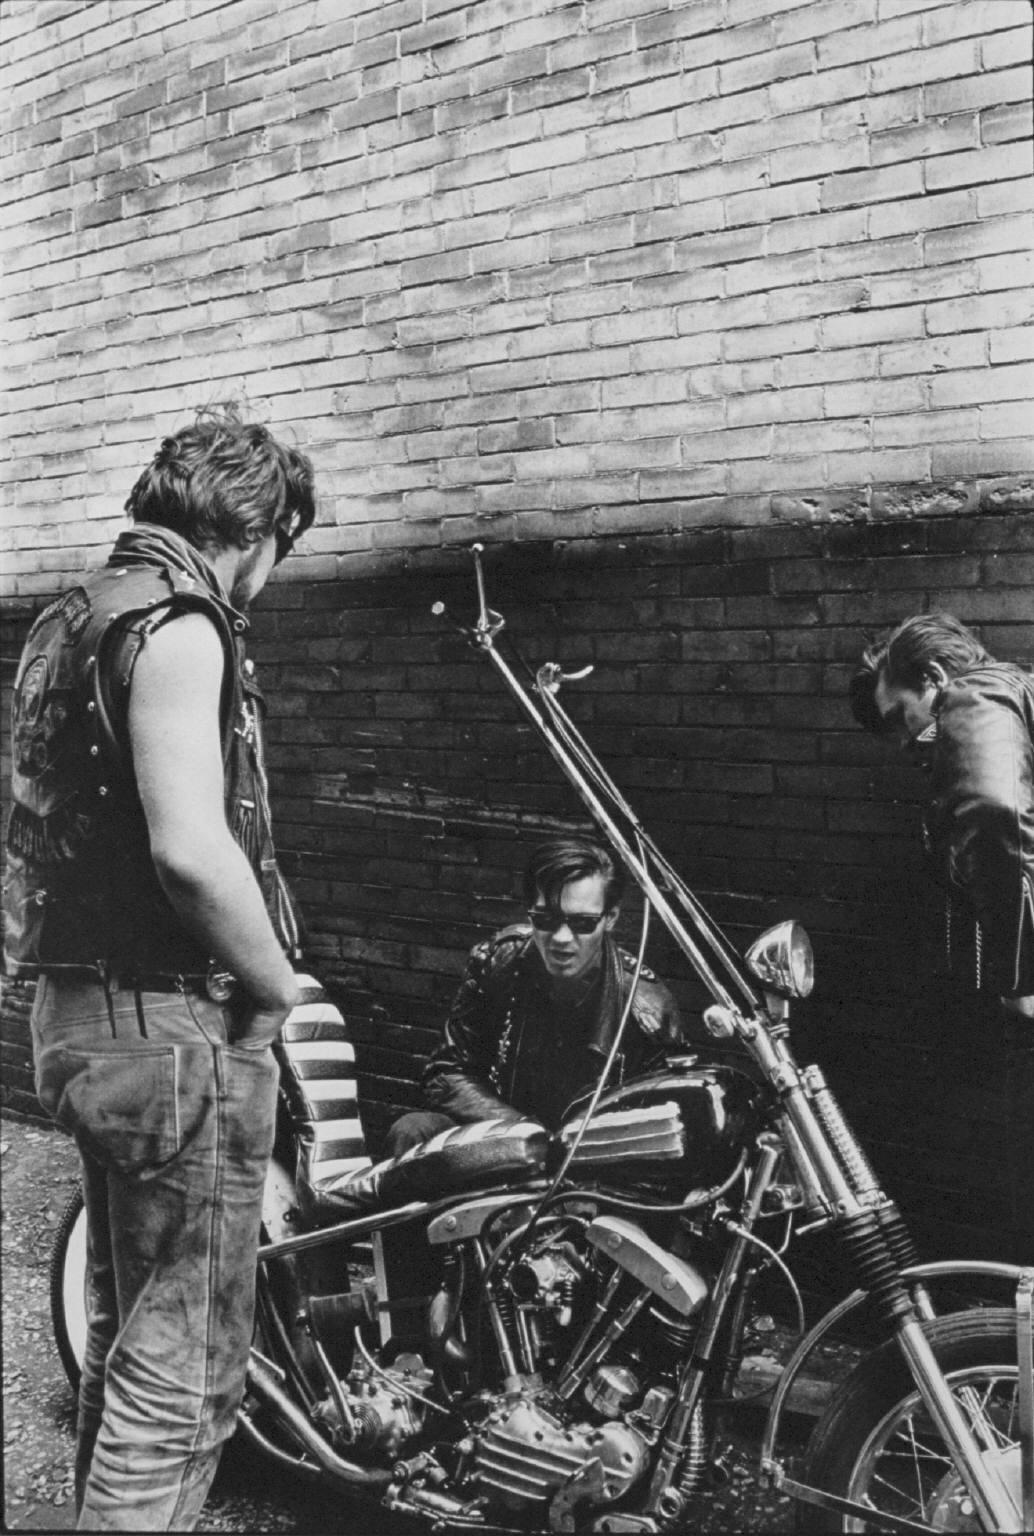 """Chopper, Milwaukee"" fro The Bikeriders by Danny Lyon  --circa 1965-66."